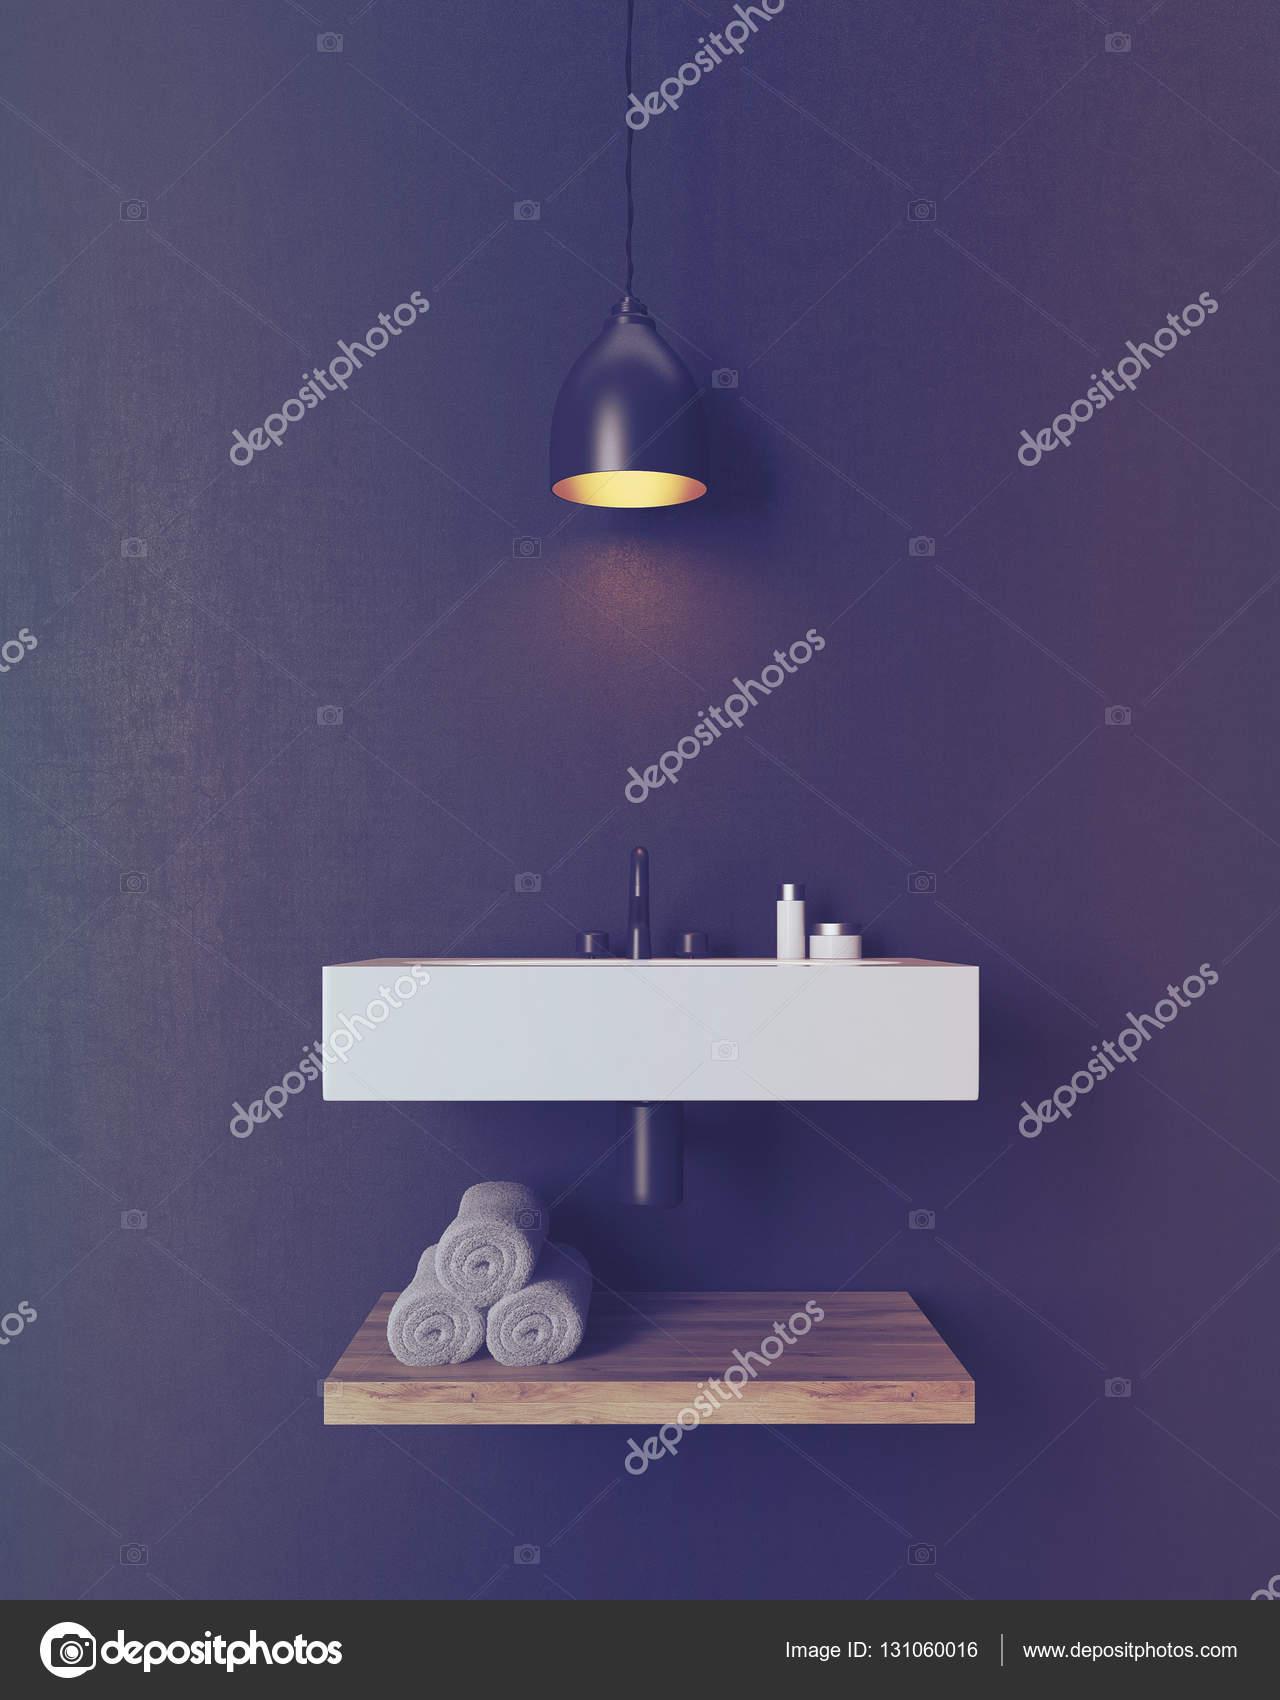 https://st3.depositphotos.com/2673929/13106/i/1600/depositphotos_131060016-stockafbeelding-badkamer-wastafel-met-houten-plank.jpg